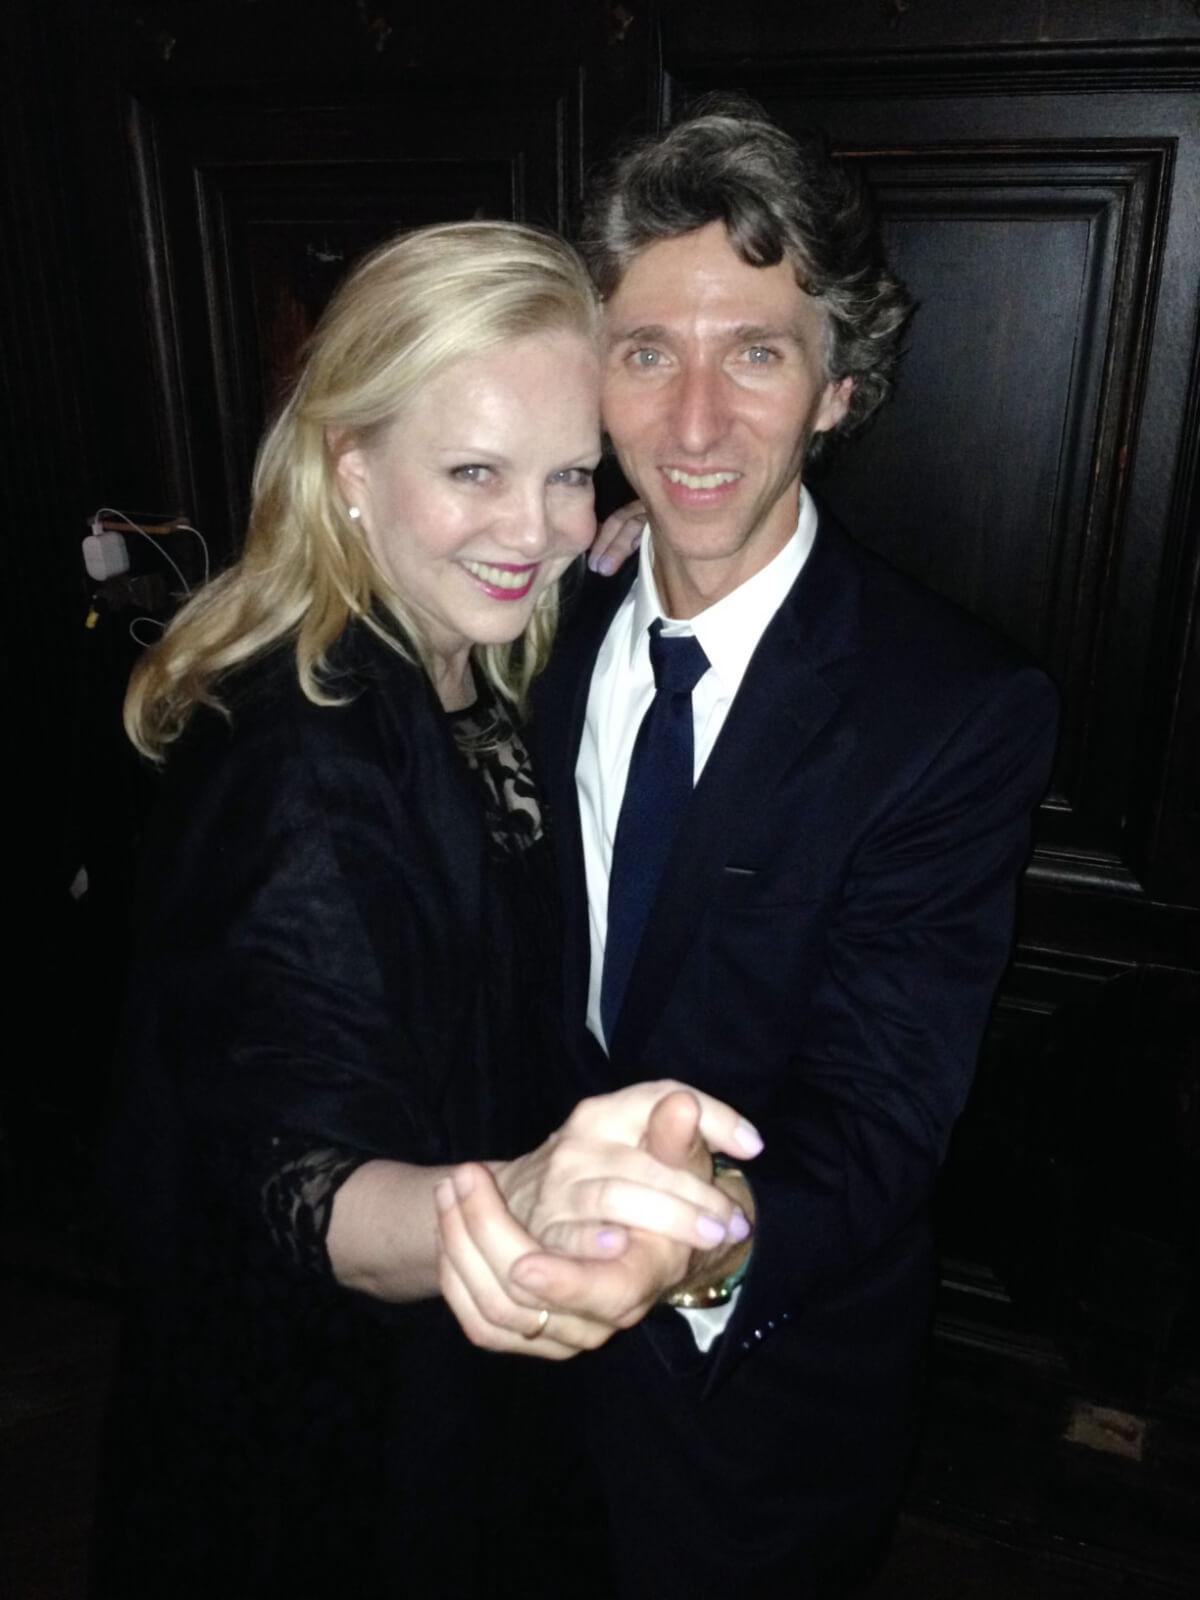 Susan Stroman posing in a partnering dance position with Damian Woetzel, president of The Juilliard School.